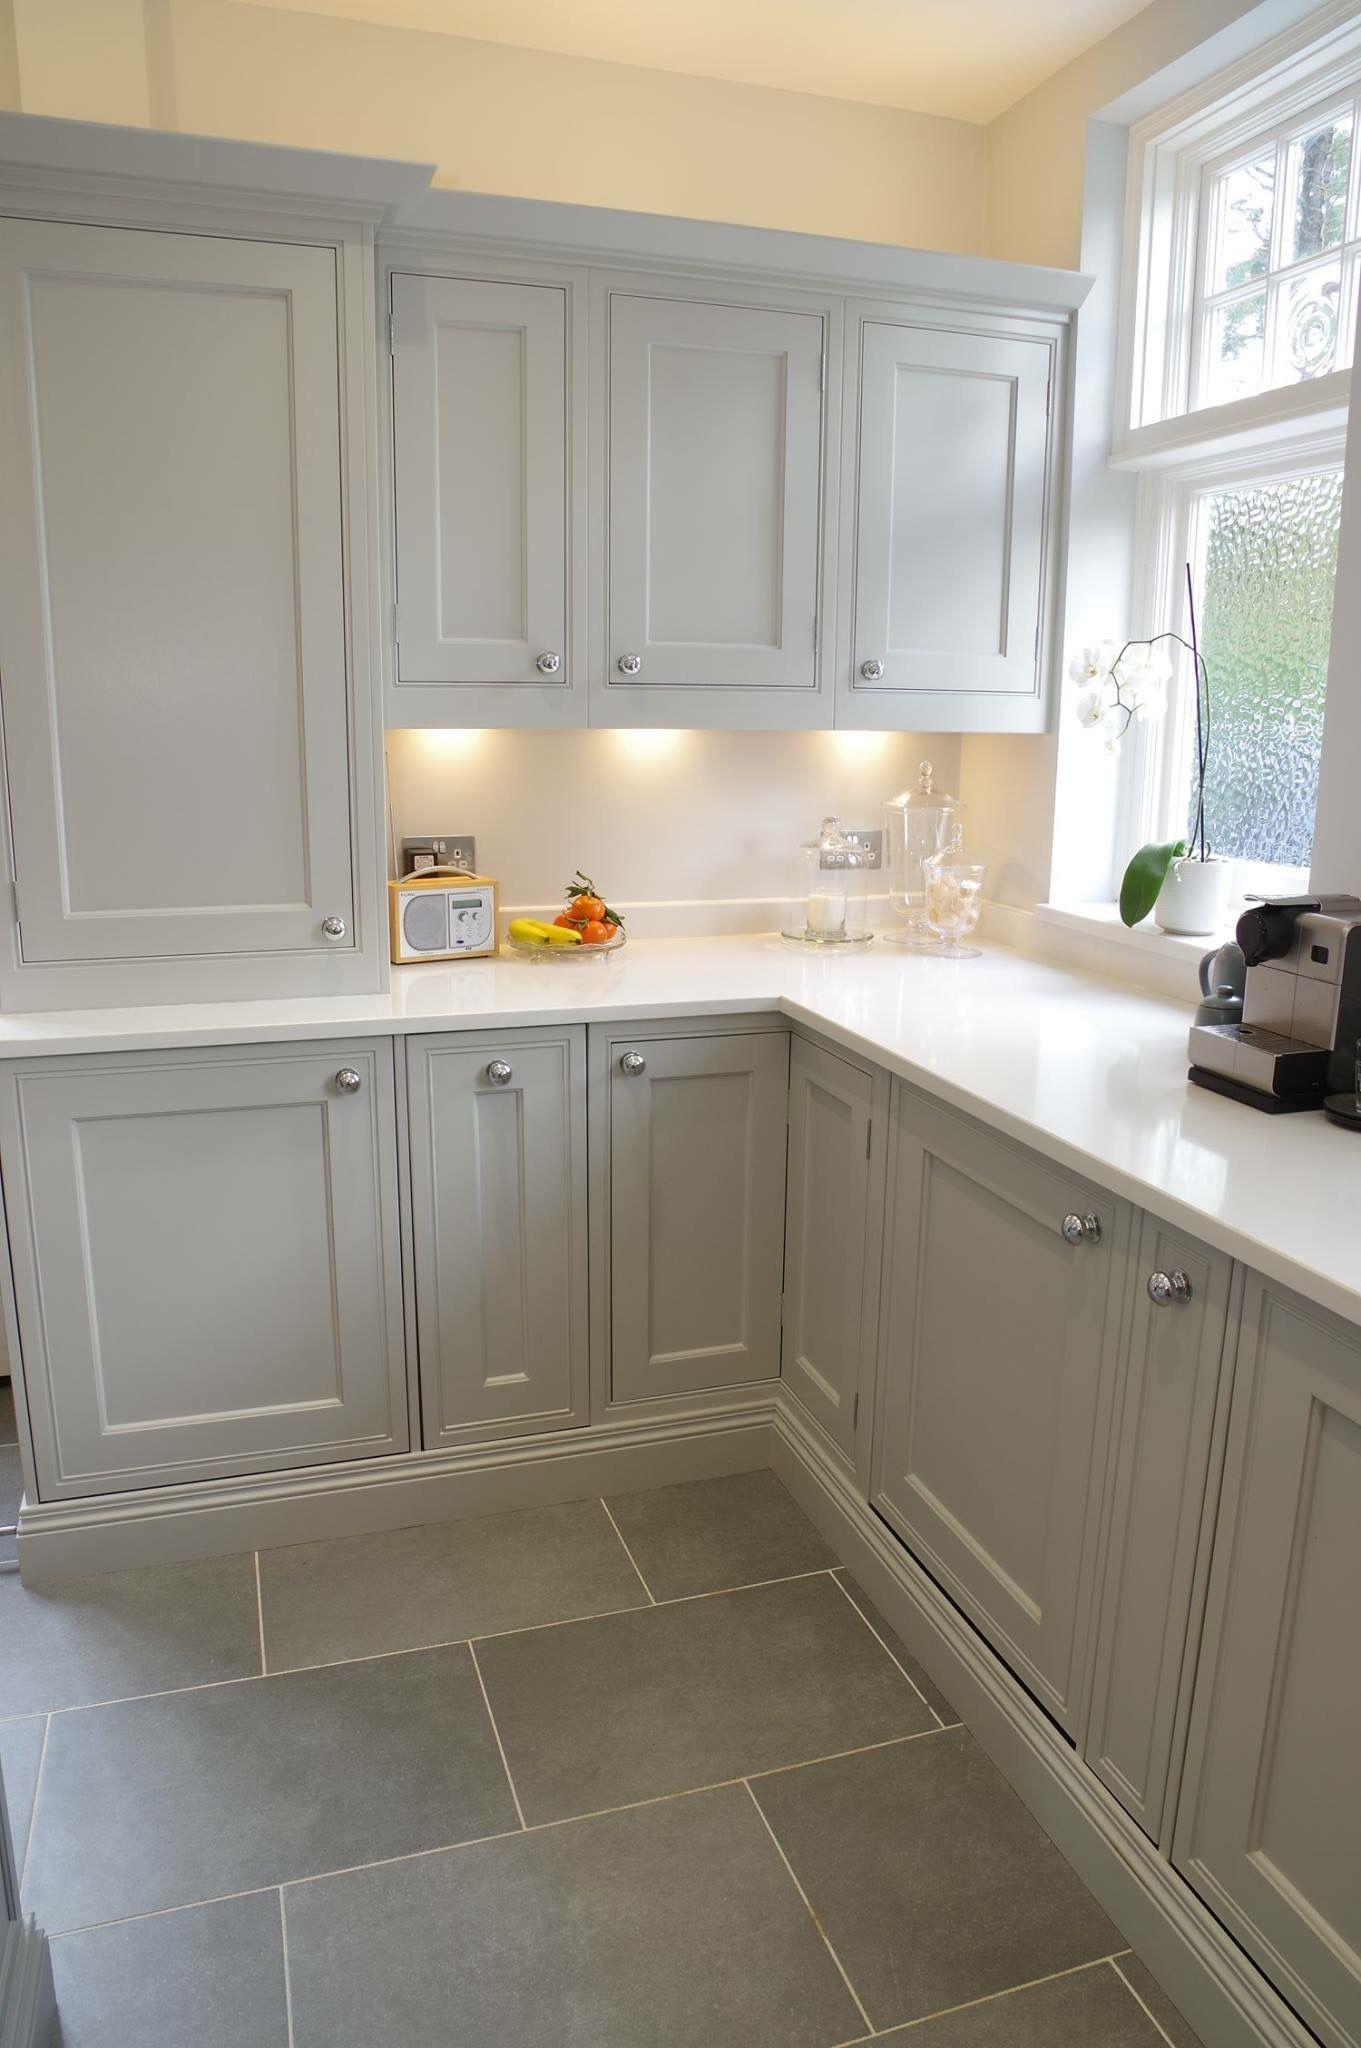 Pin By Theresa Opalka Boorse On Kitchen Kitchen Interior Grey